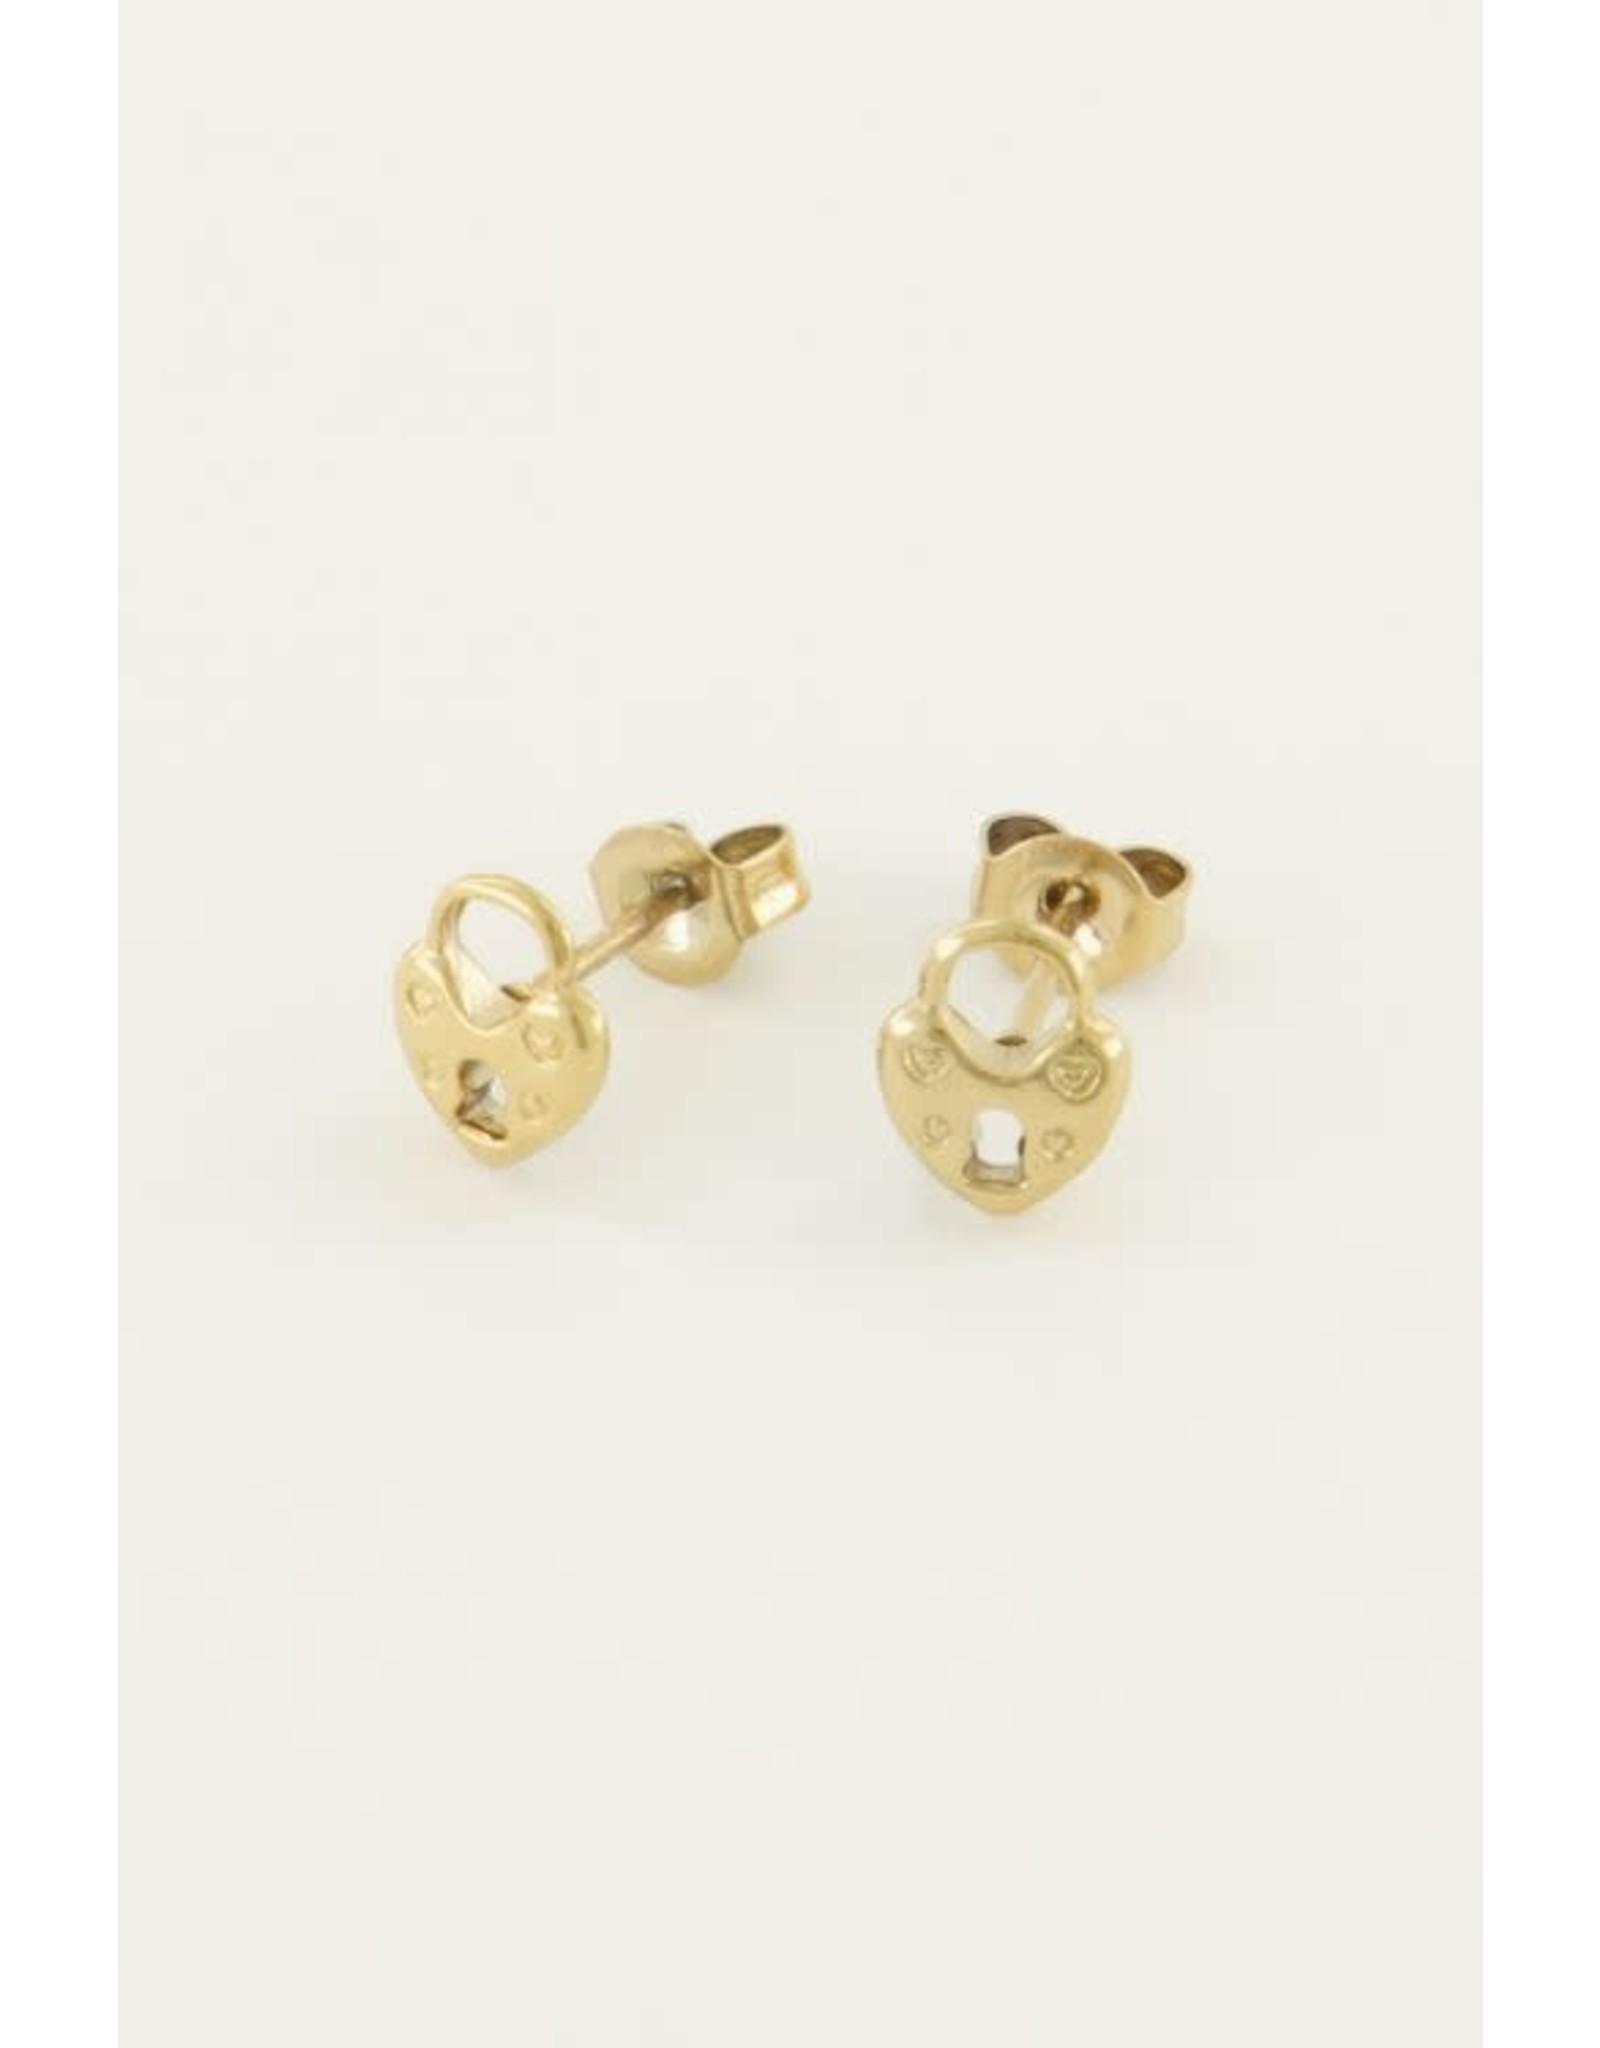 My Jewellery My Jewellery earstuds hartjes slot